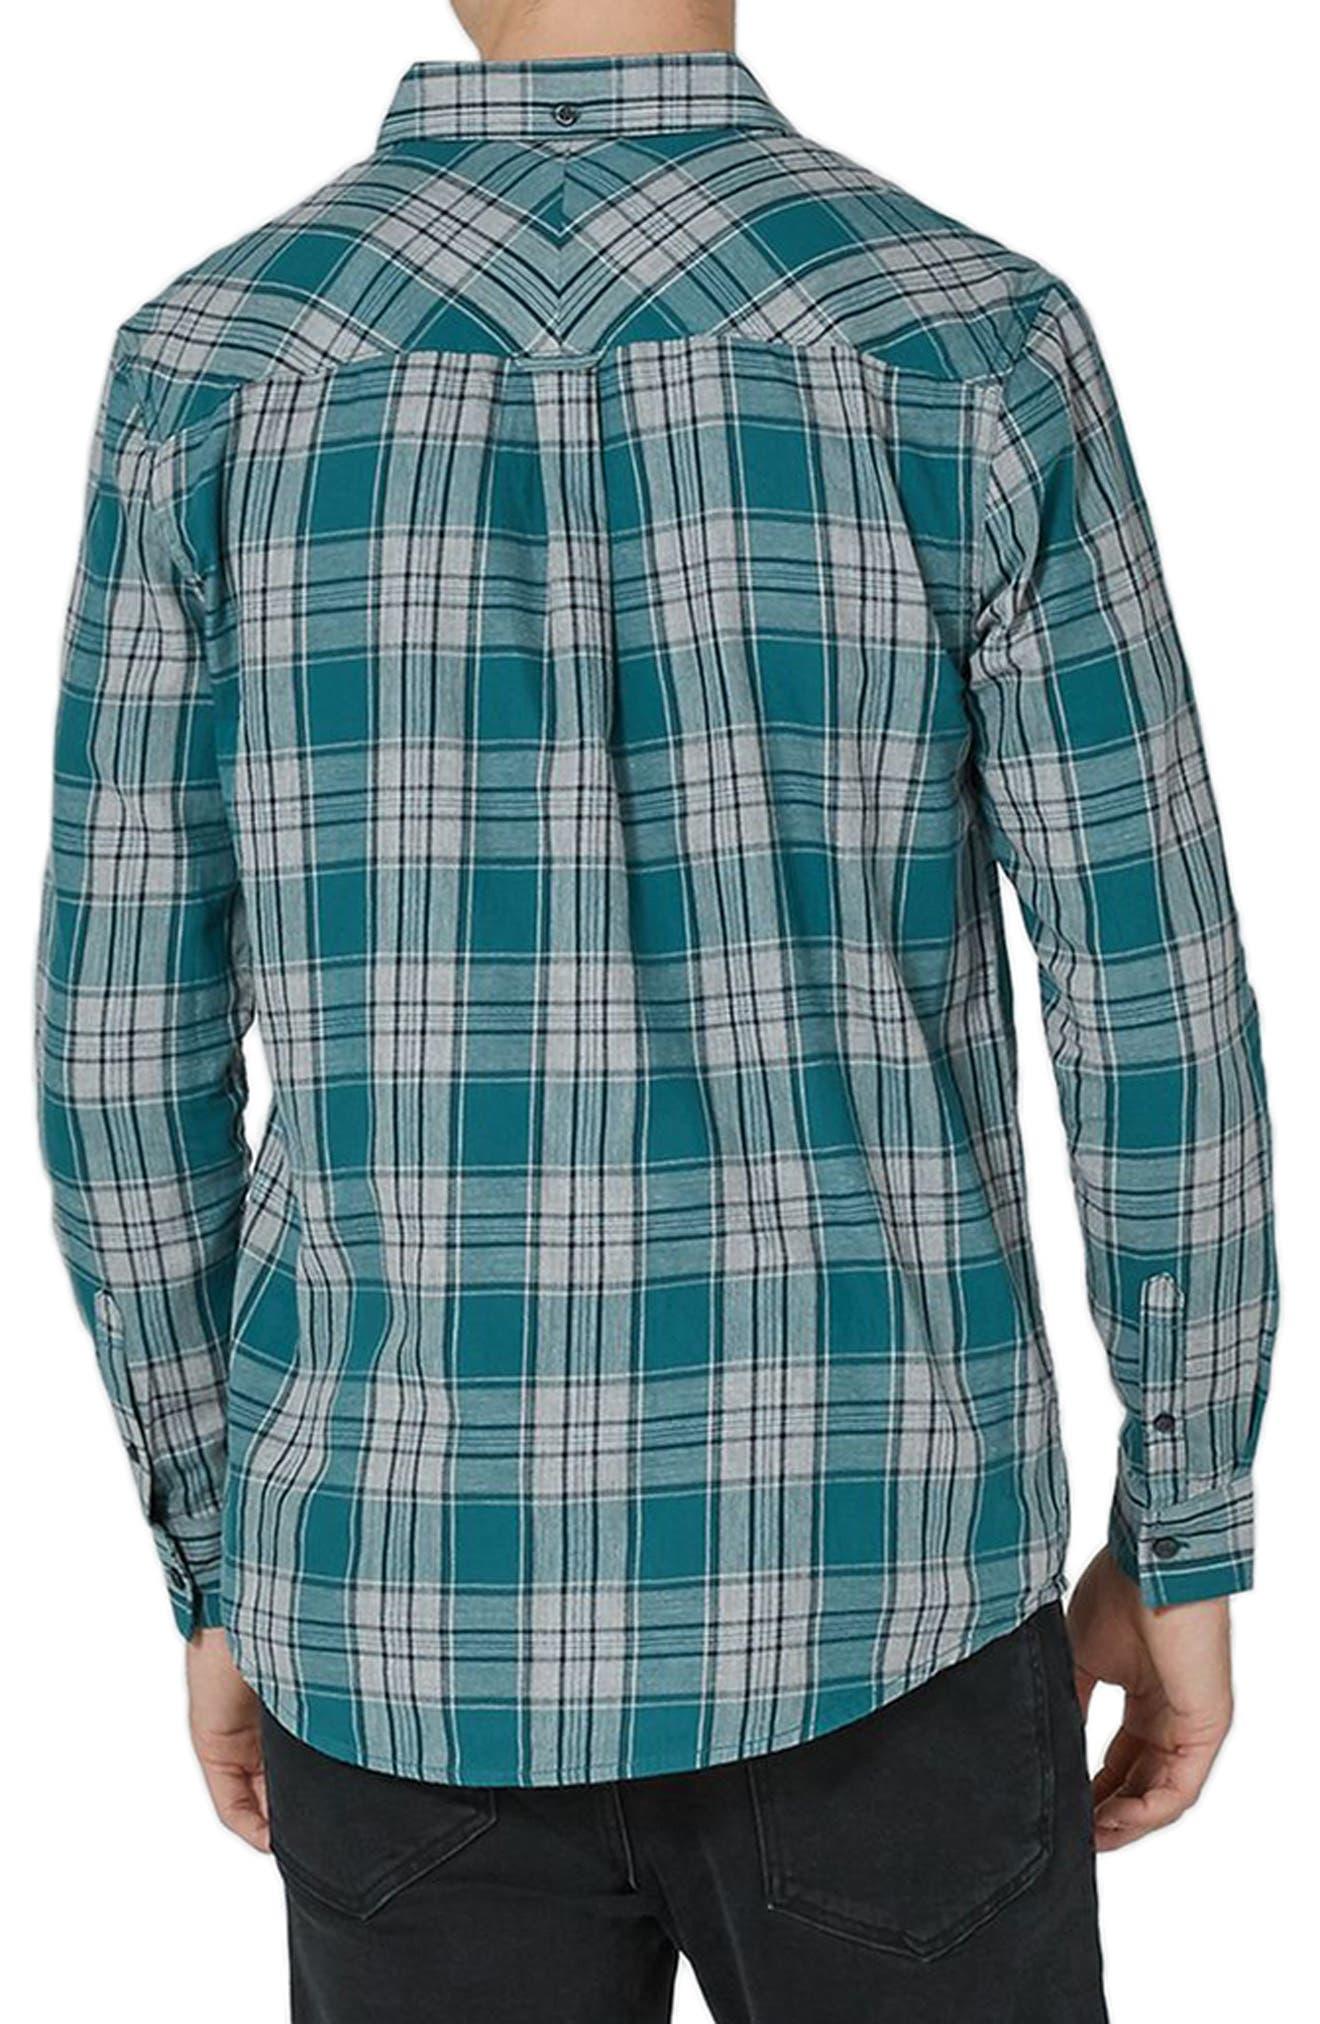 Charlie Check Shirt,                             Alternate thumbnail 2, color,                             Blue Multi